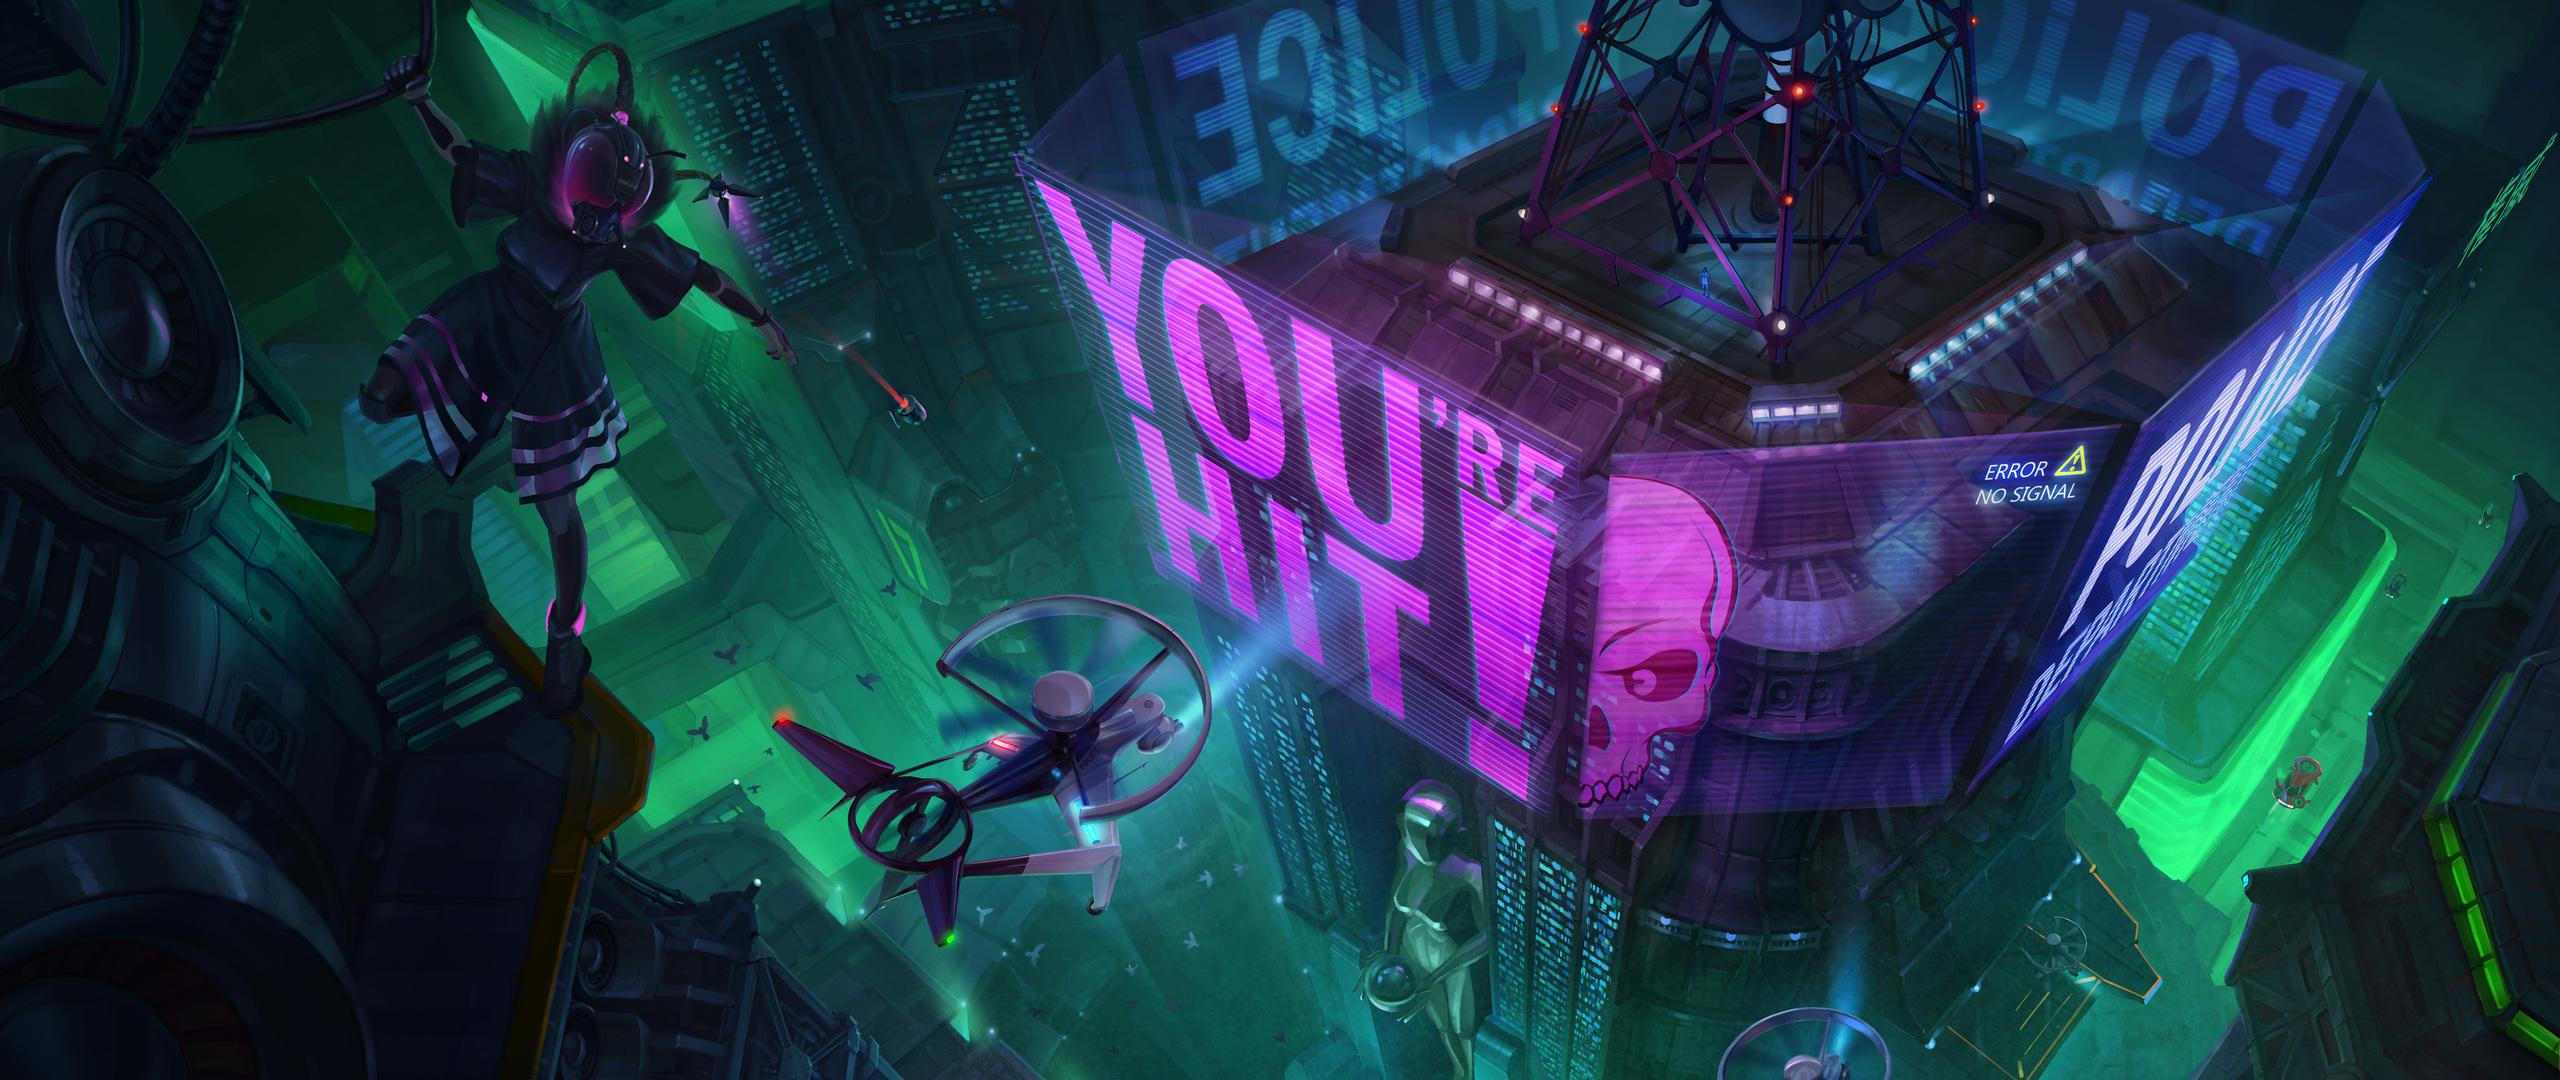 hologram-city-cyberpunk-8k-yn.jpg